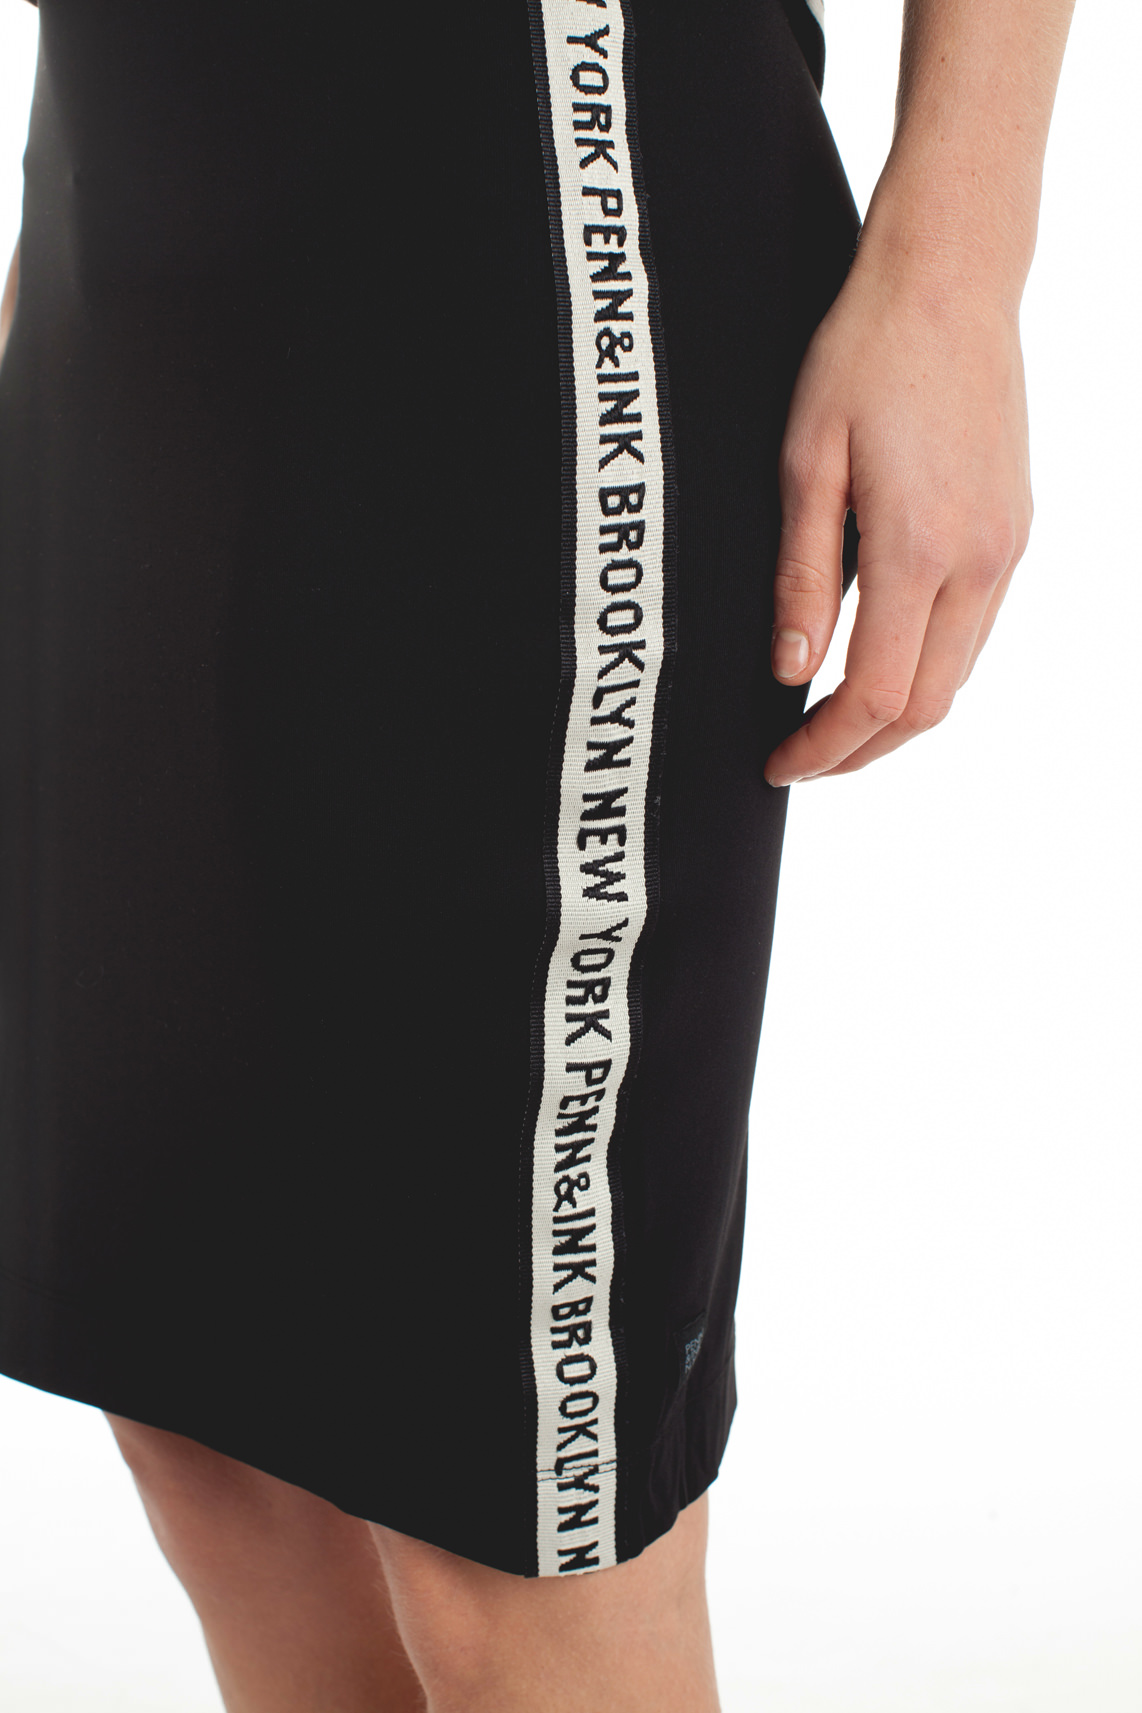 Penn & Ink Dames Rok met tekstprint zwart